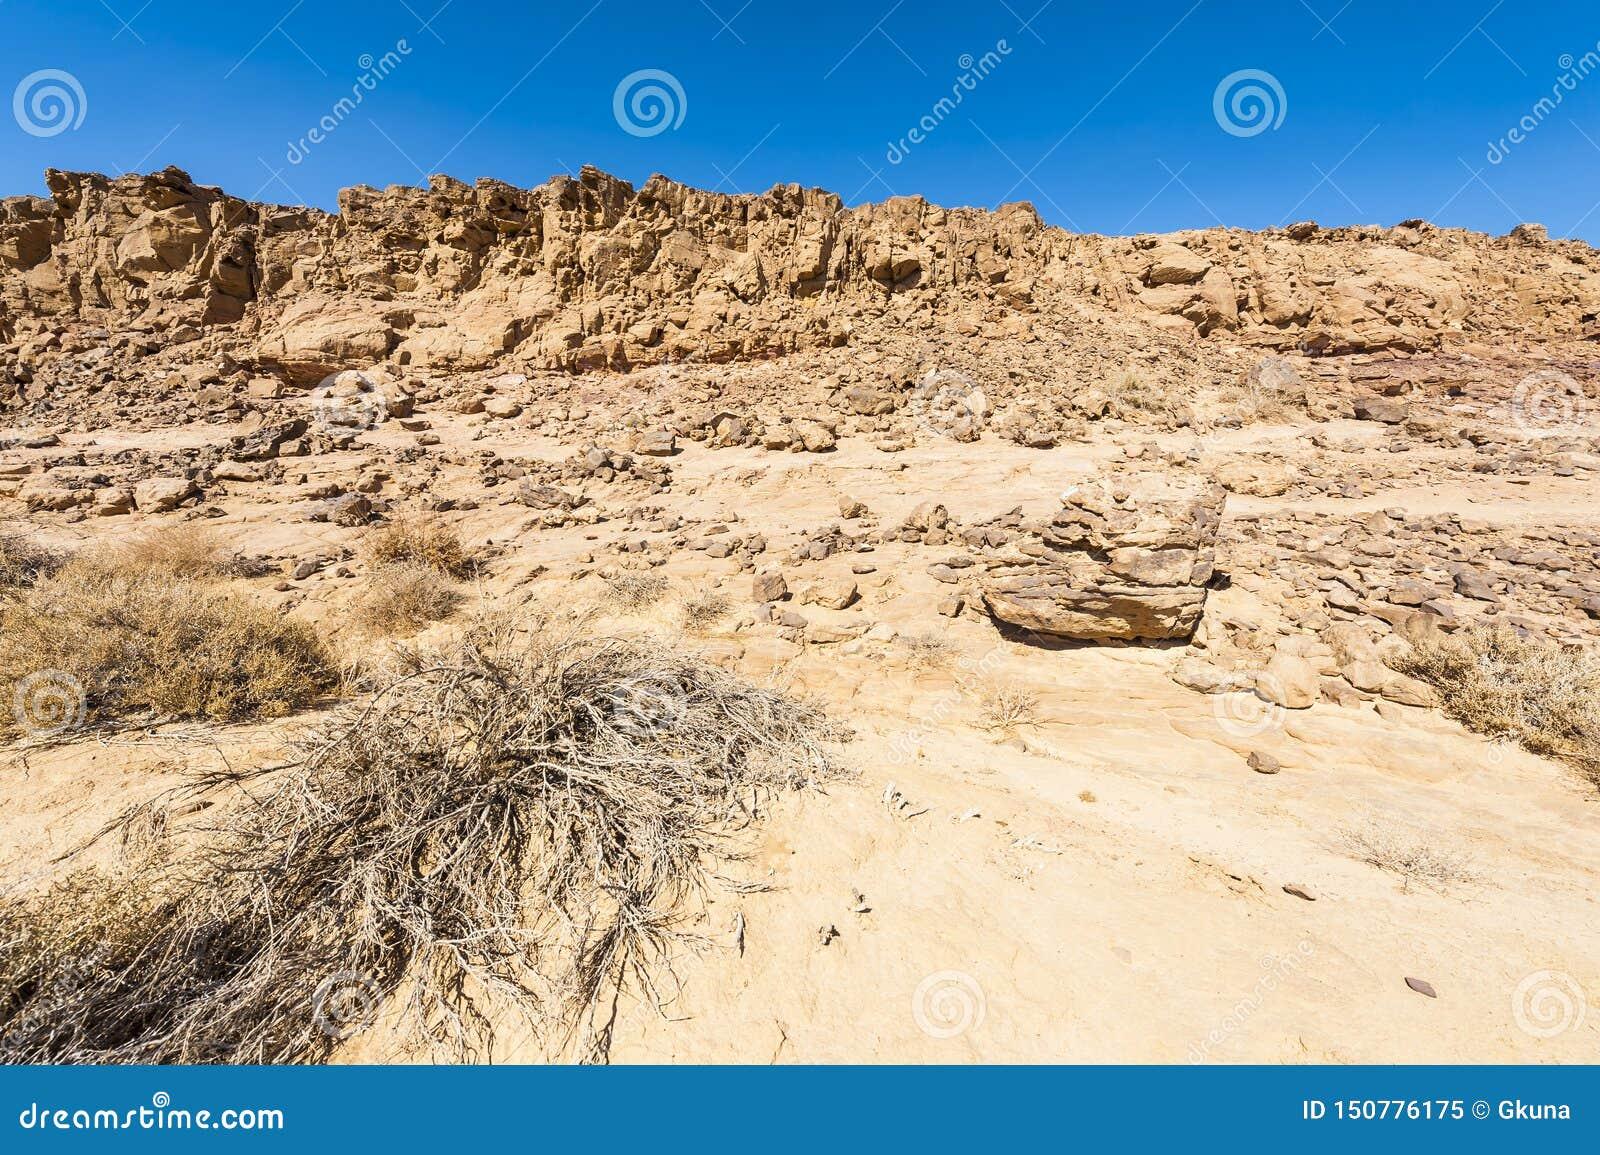 Desierto del N?guev en Israel